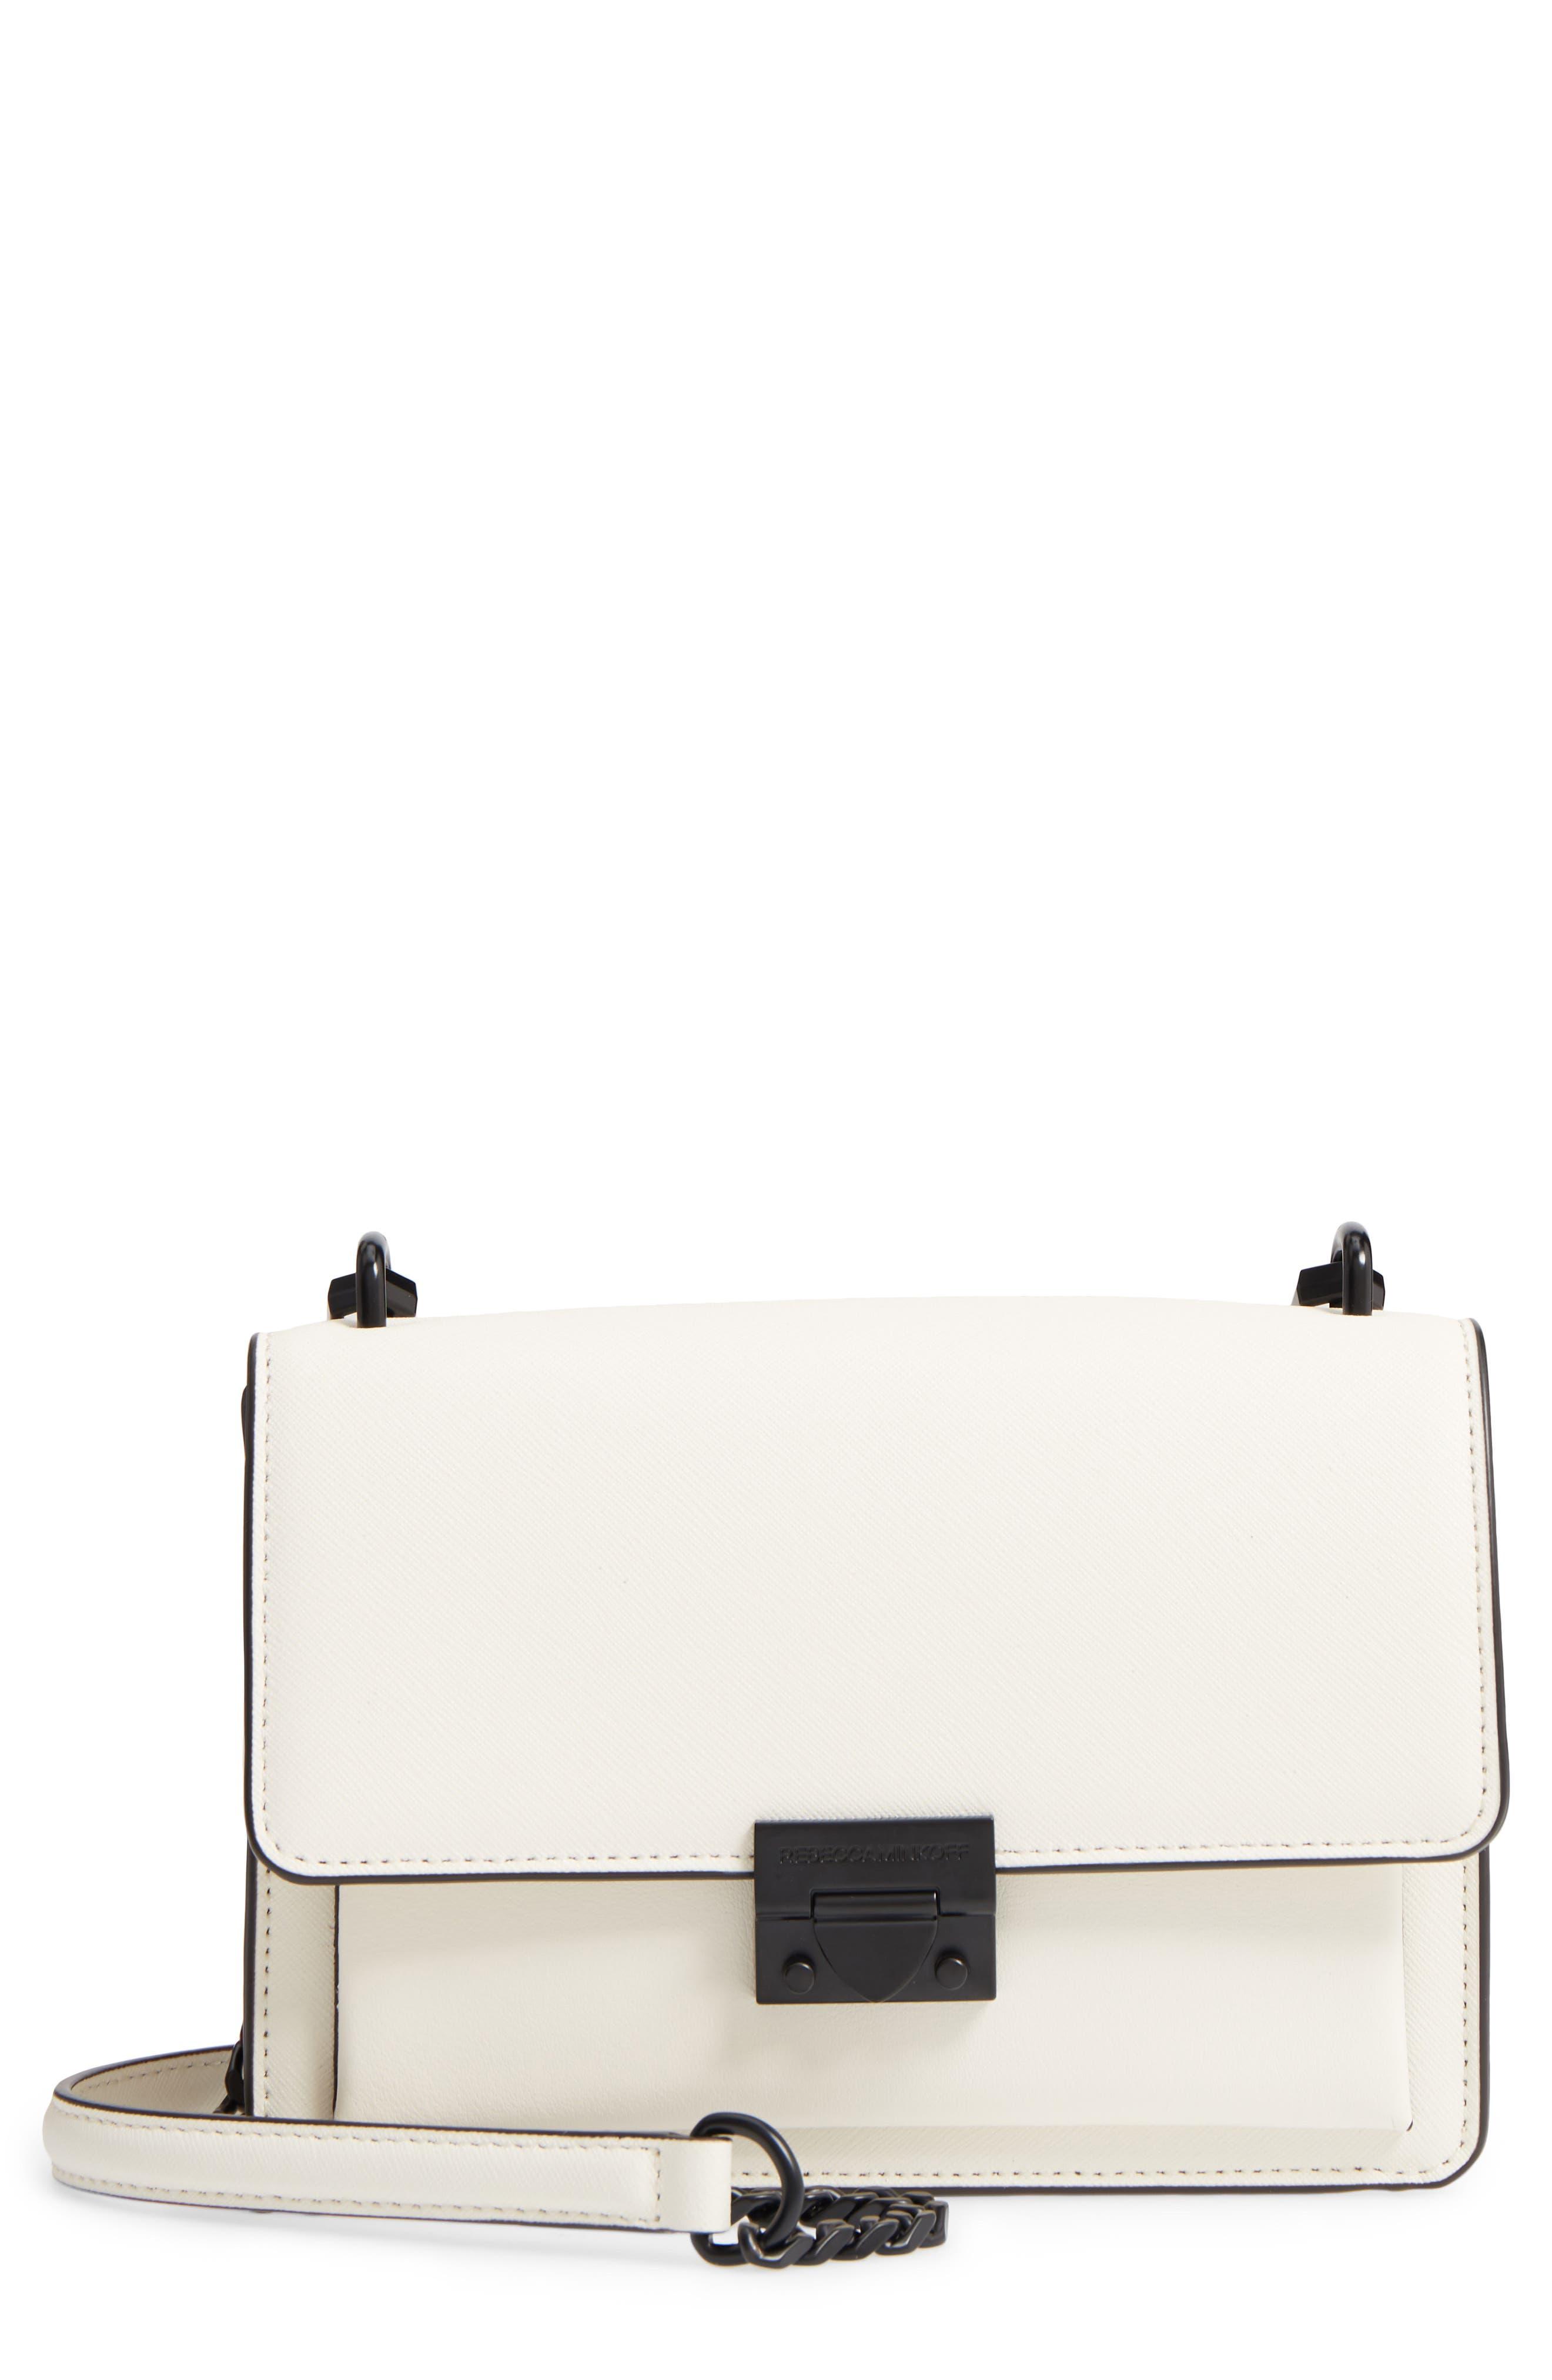 Medium Christy Leather Shoulder Bag,                             Main thumbnail 1, color,